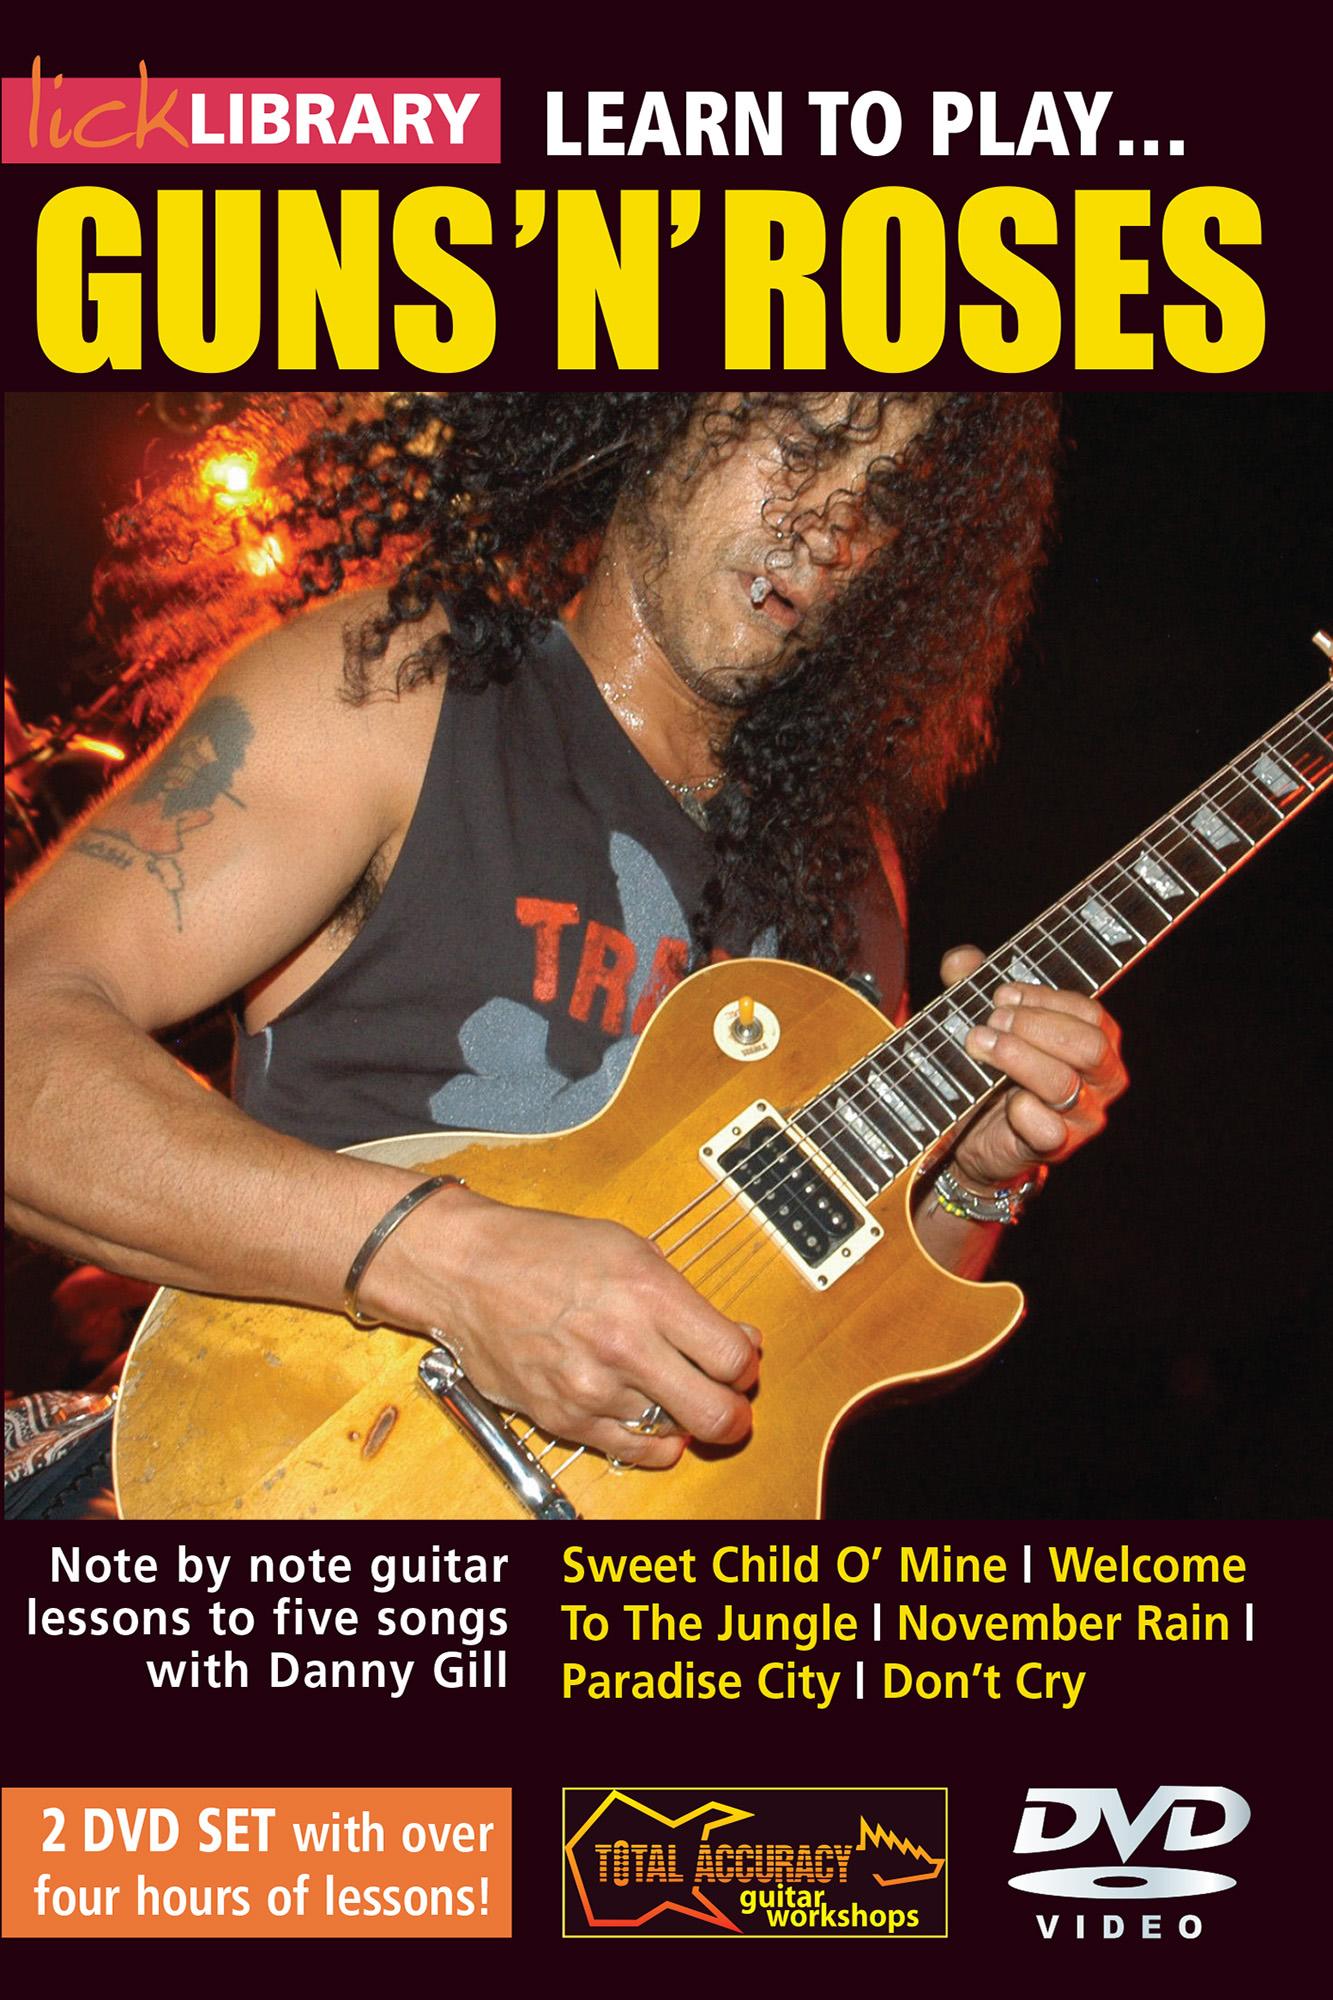 Learn To Play Guns N' Roses